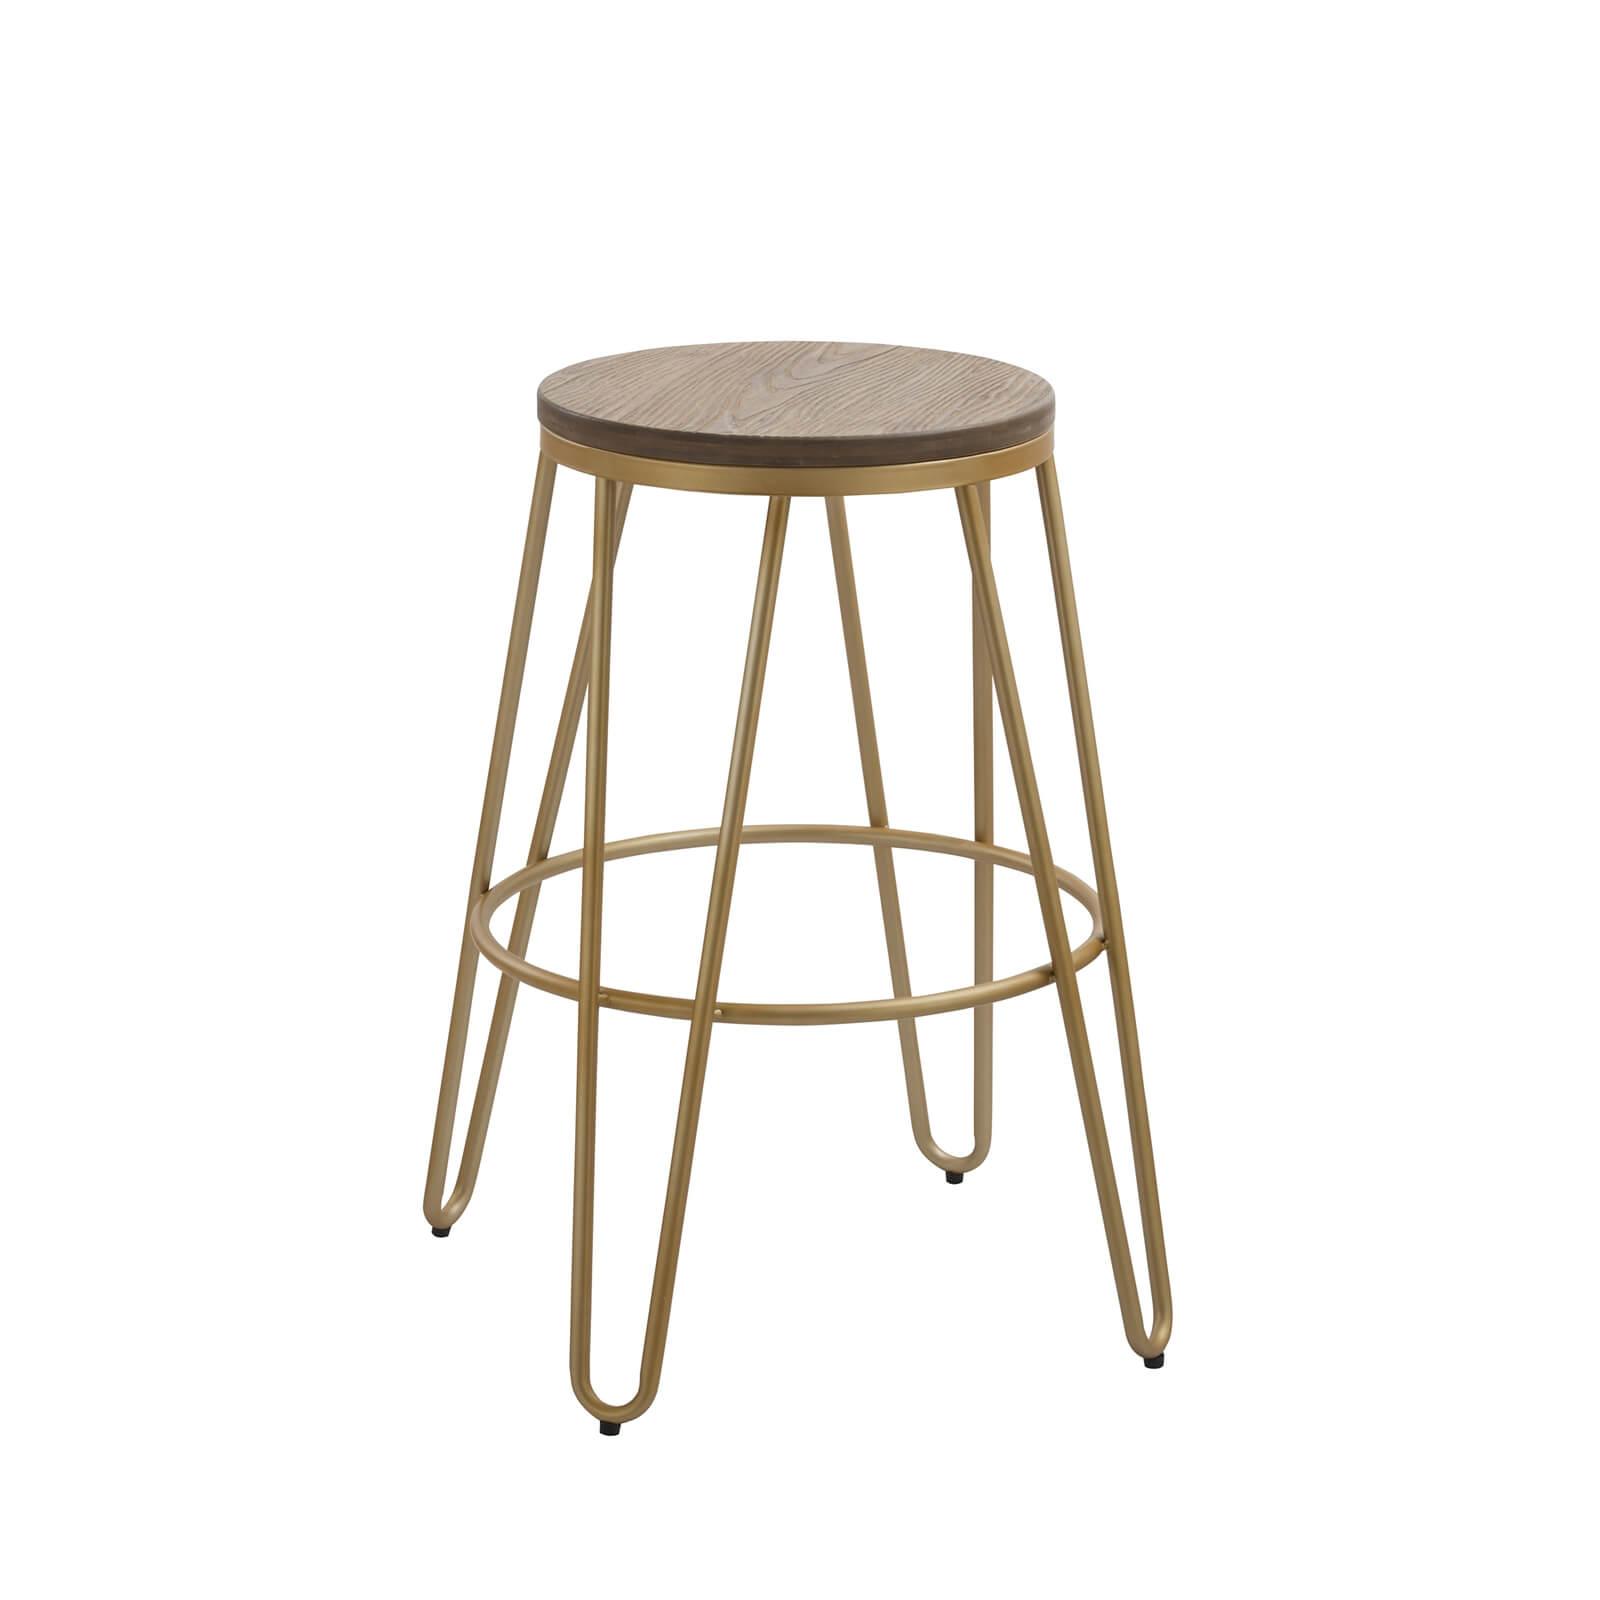 Ikon Wood Seat with Gold Legs Bar Stool